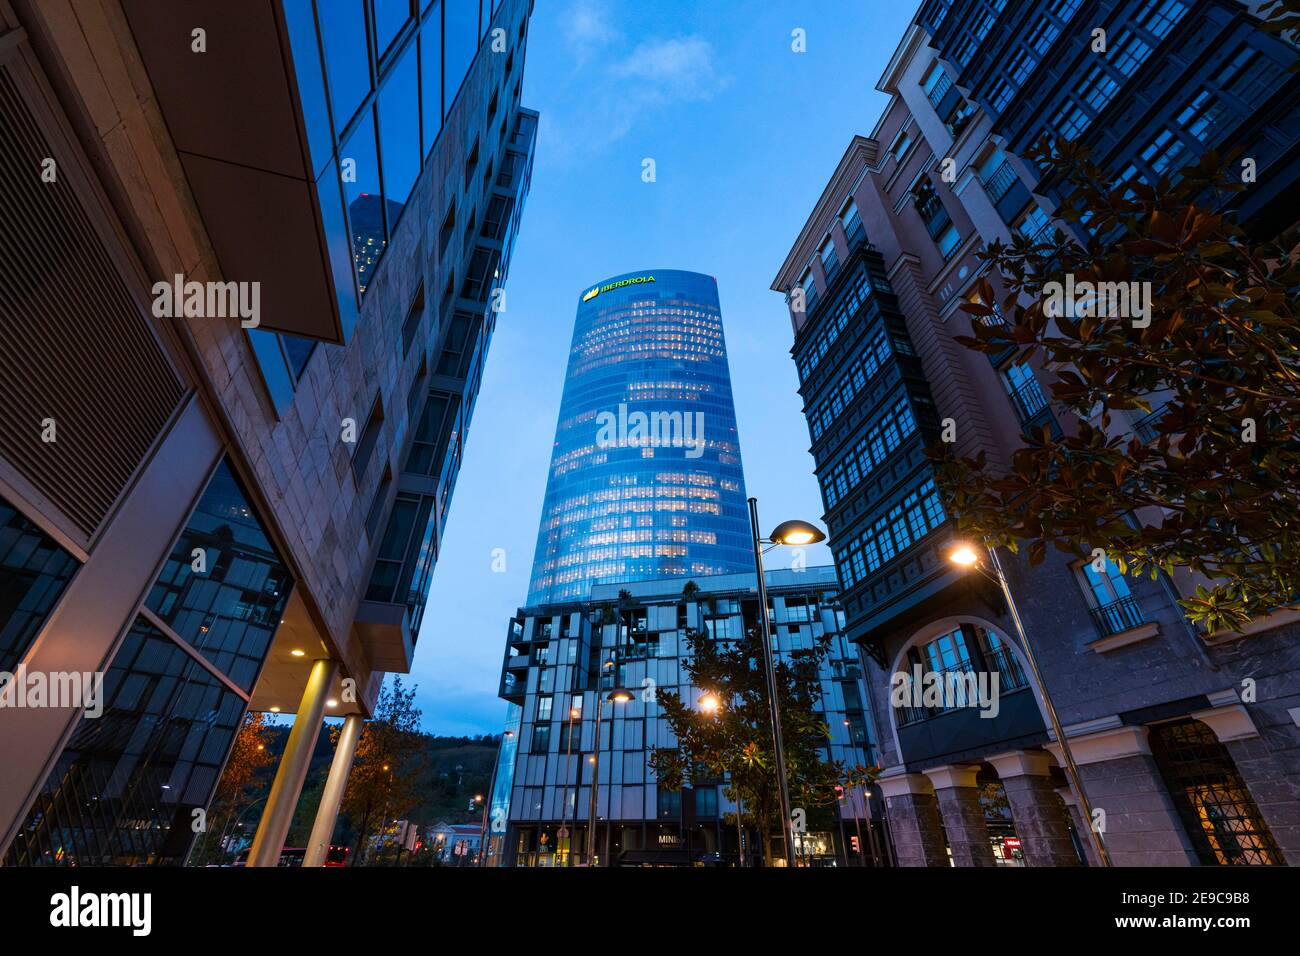 Iberdrola Tower, Bilbao, Bizkaia, Basque Country, Spain, Europe. Stock Photo